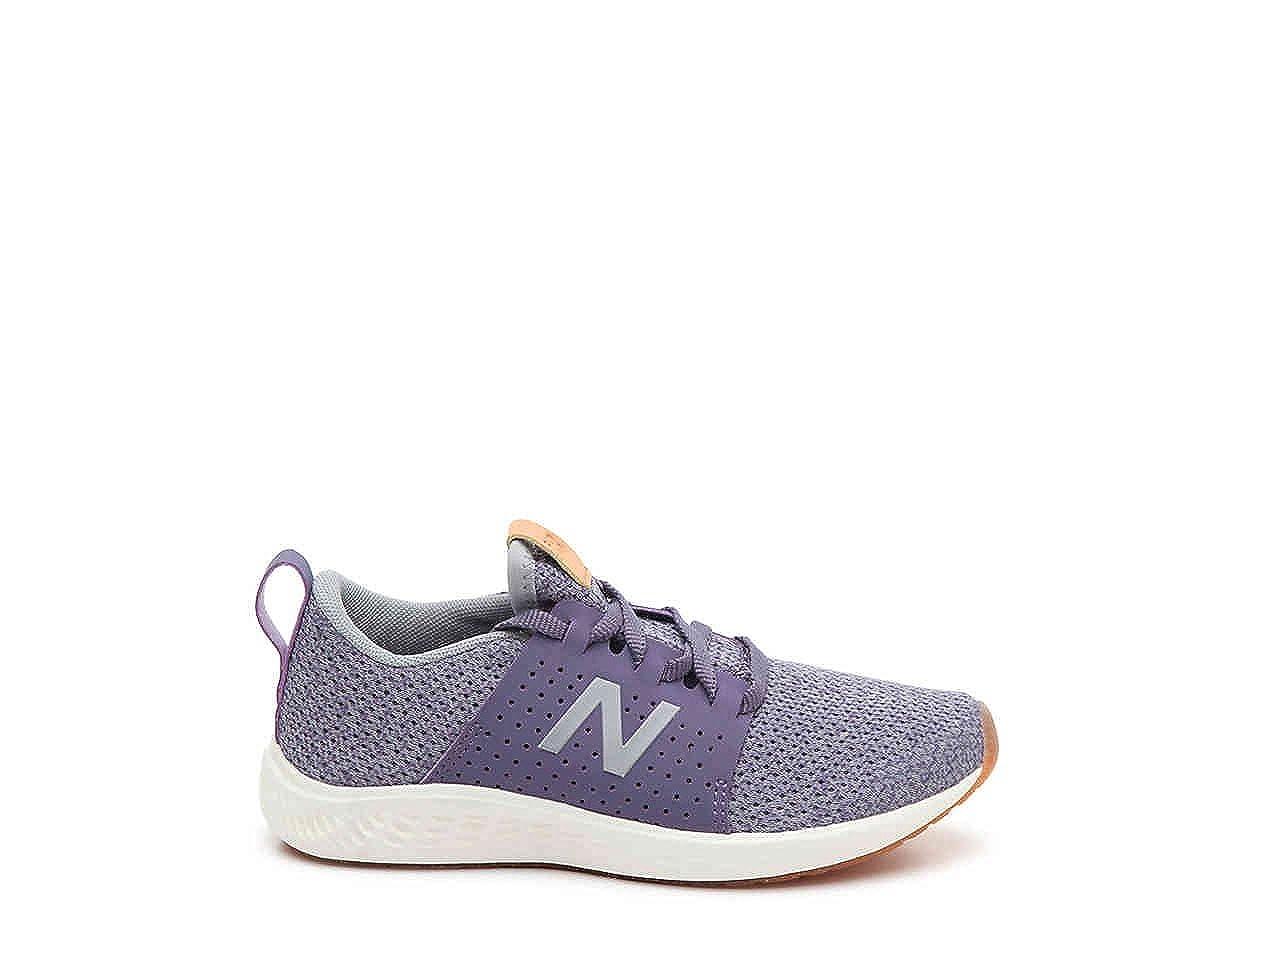 New Balance Kids Fresh Foam Cruz Running Shoe